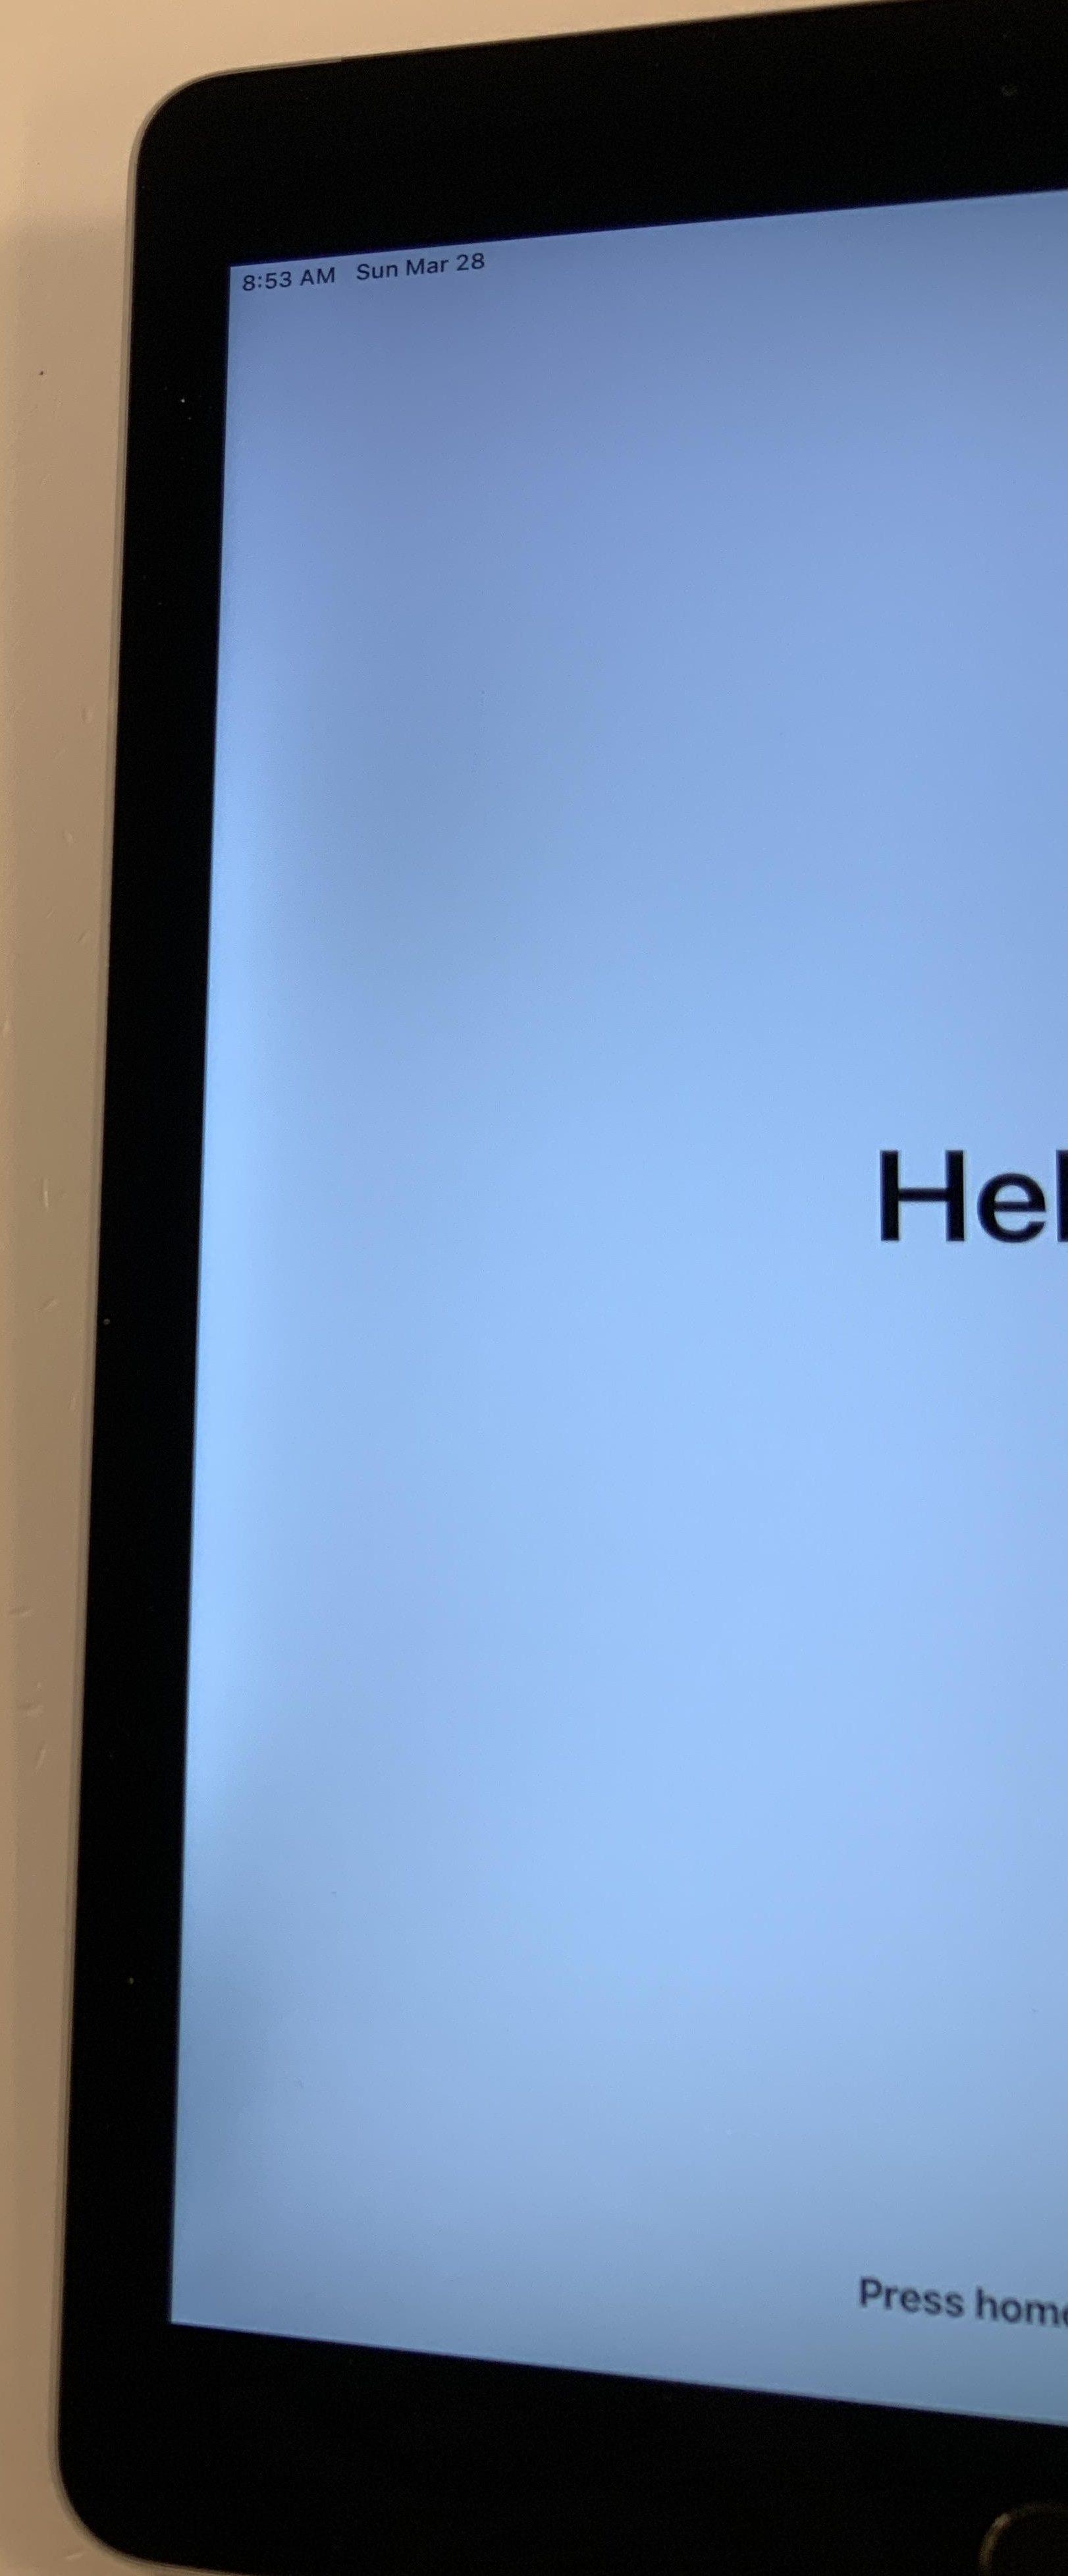 iPad Air 2 Wi-Fi + Cellular 64GB, 64GB, Space Gray, obraz 4